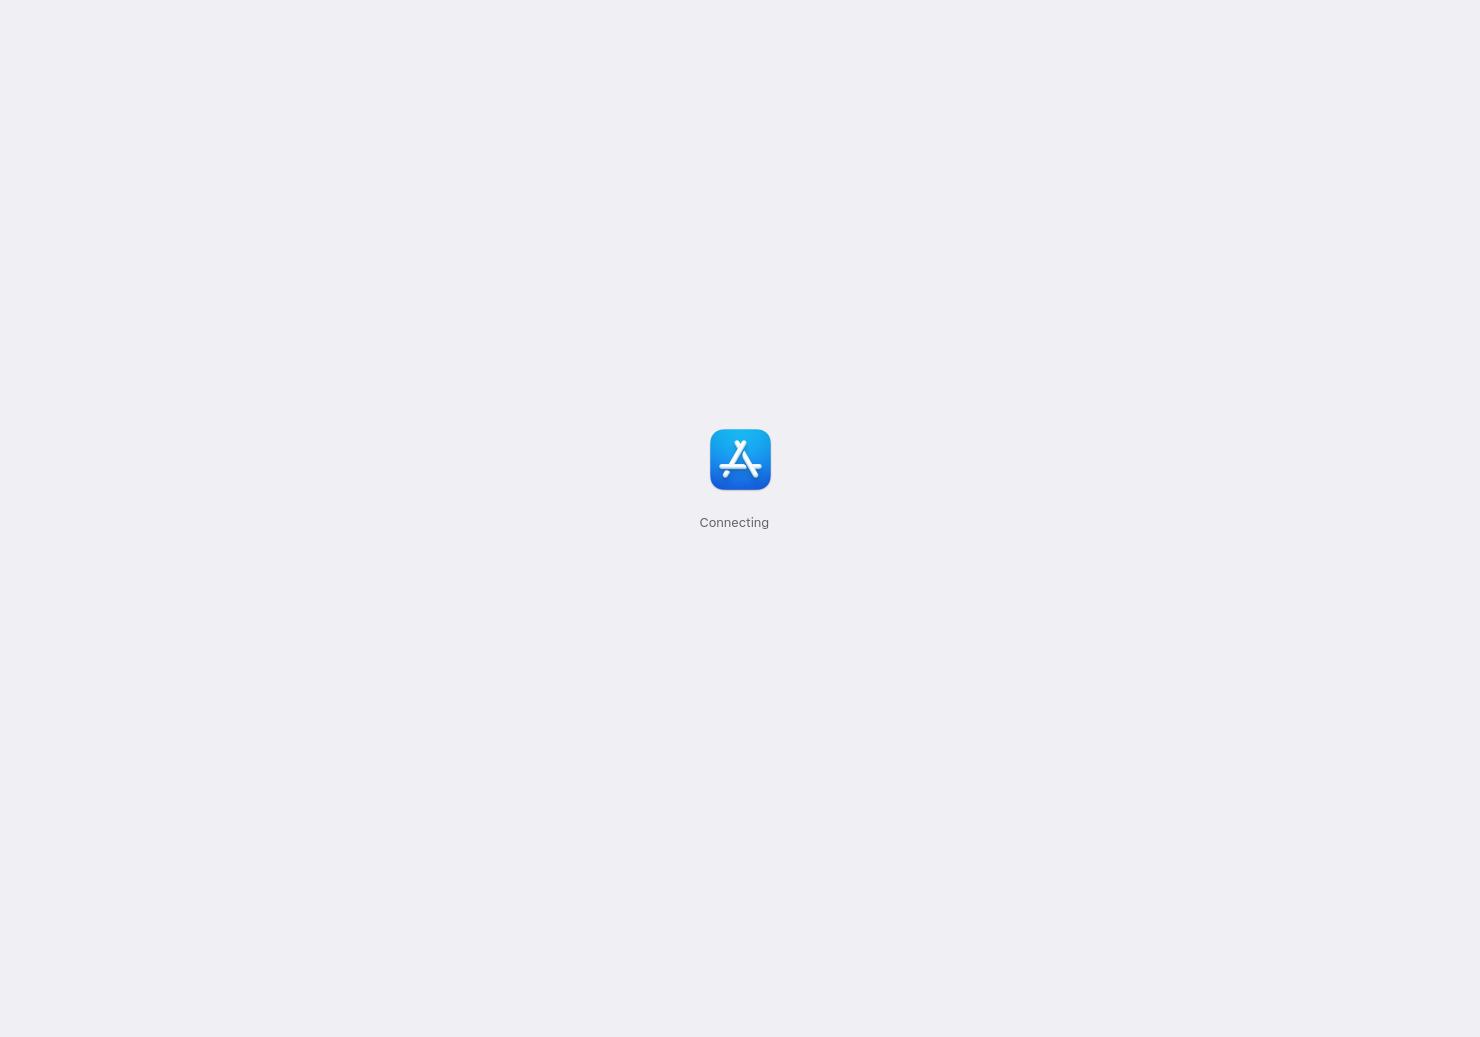 ?max width=300&url=https%3a%2f%2fapps.apple